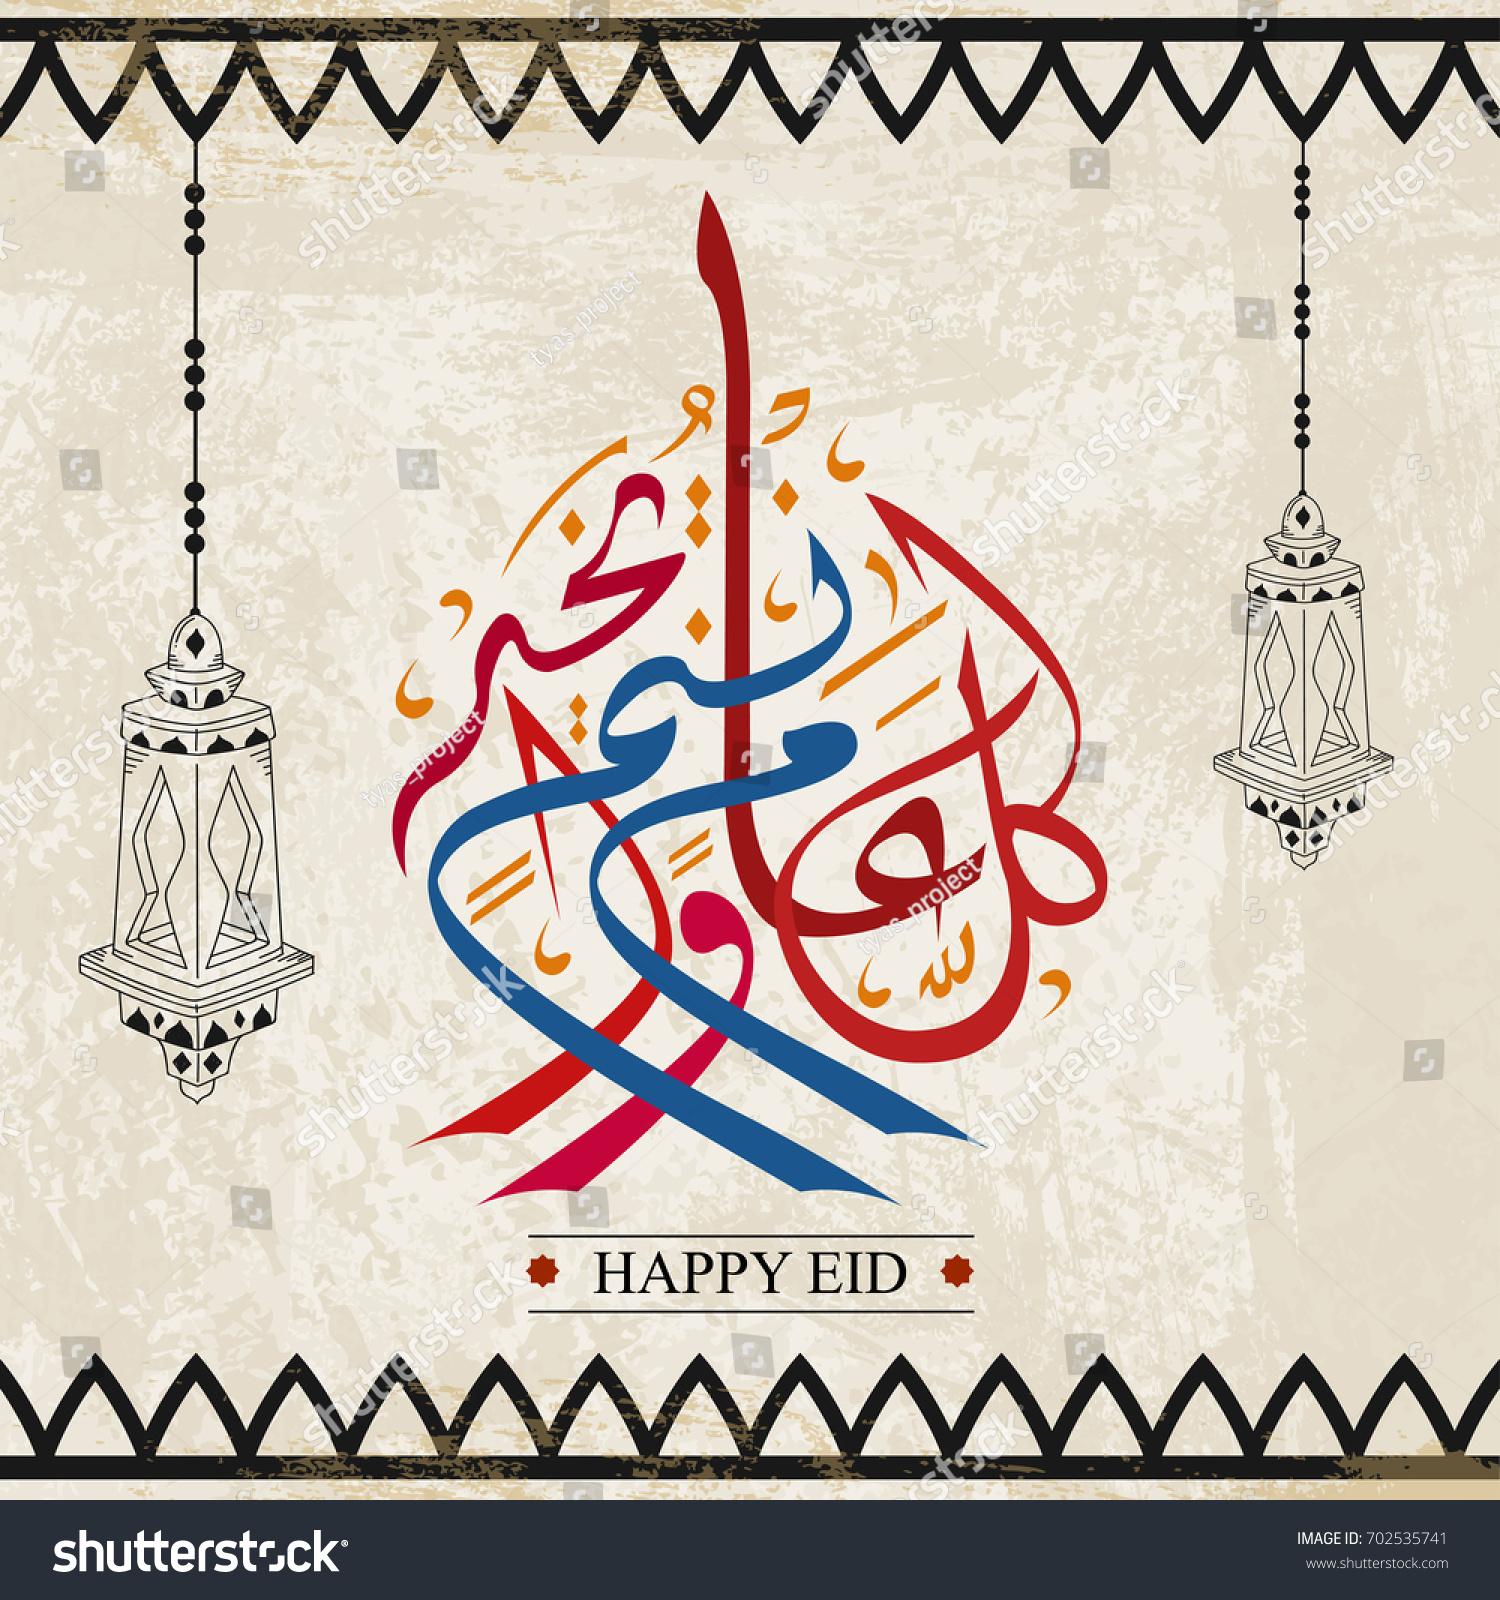 Eid mubarak happy new year greetings stock vector royalty free eid mubarak and happy new year greetings card in arabic calligraphy arabic islamic calligraphy of m4hsunfo